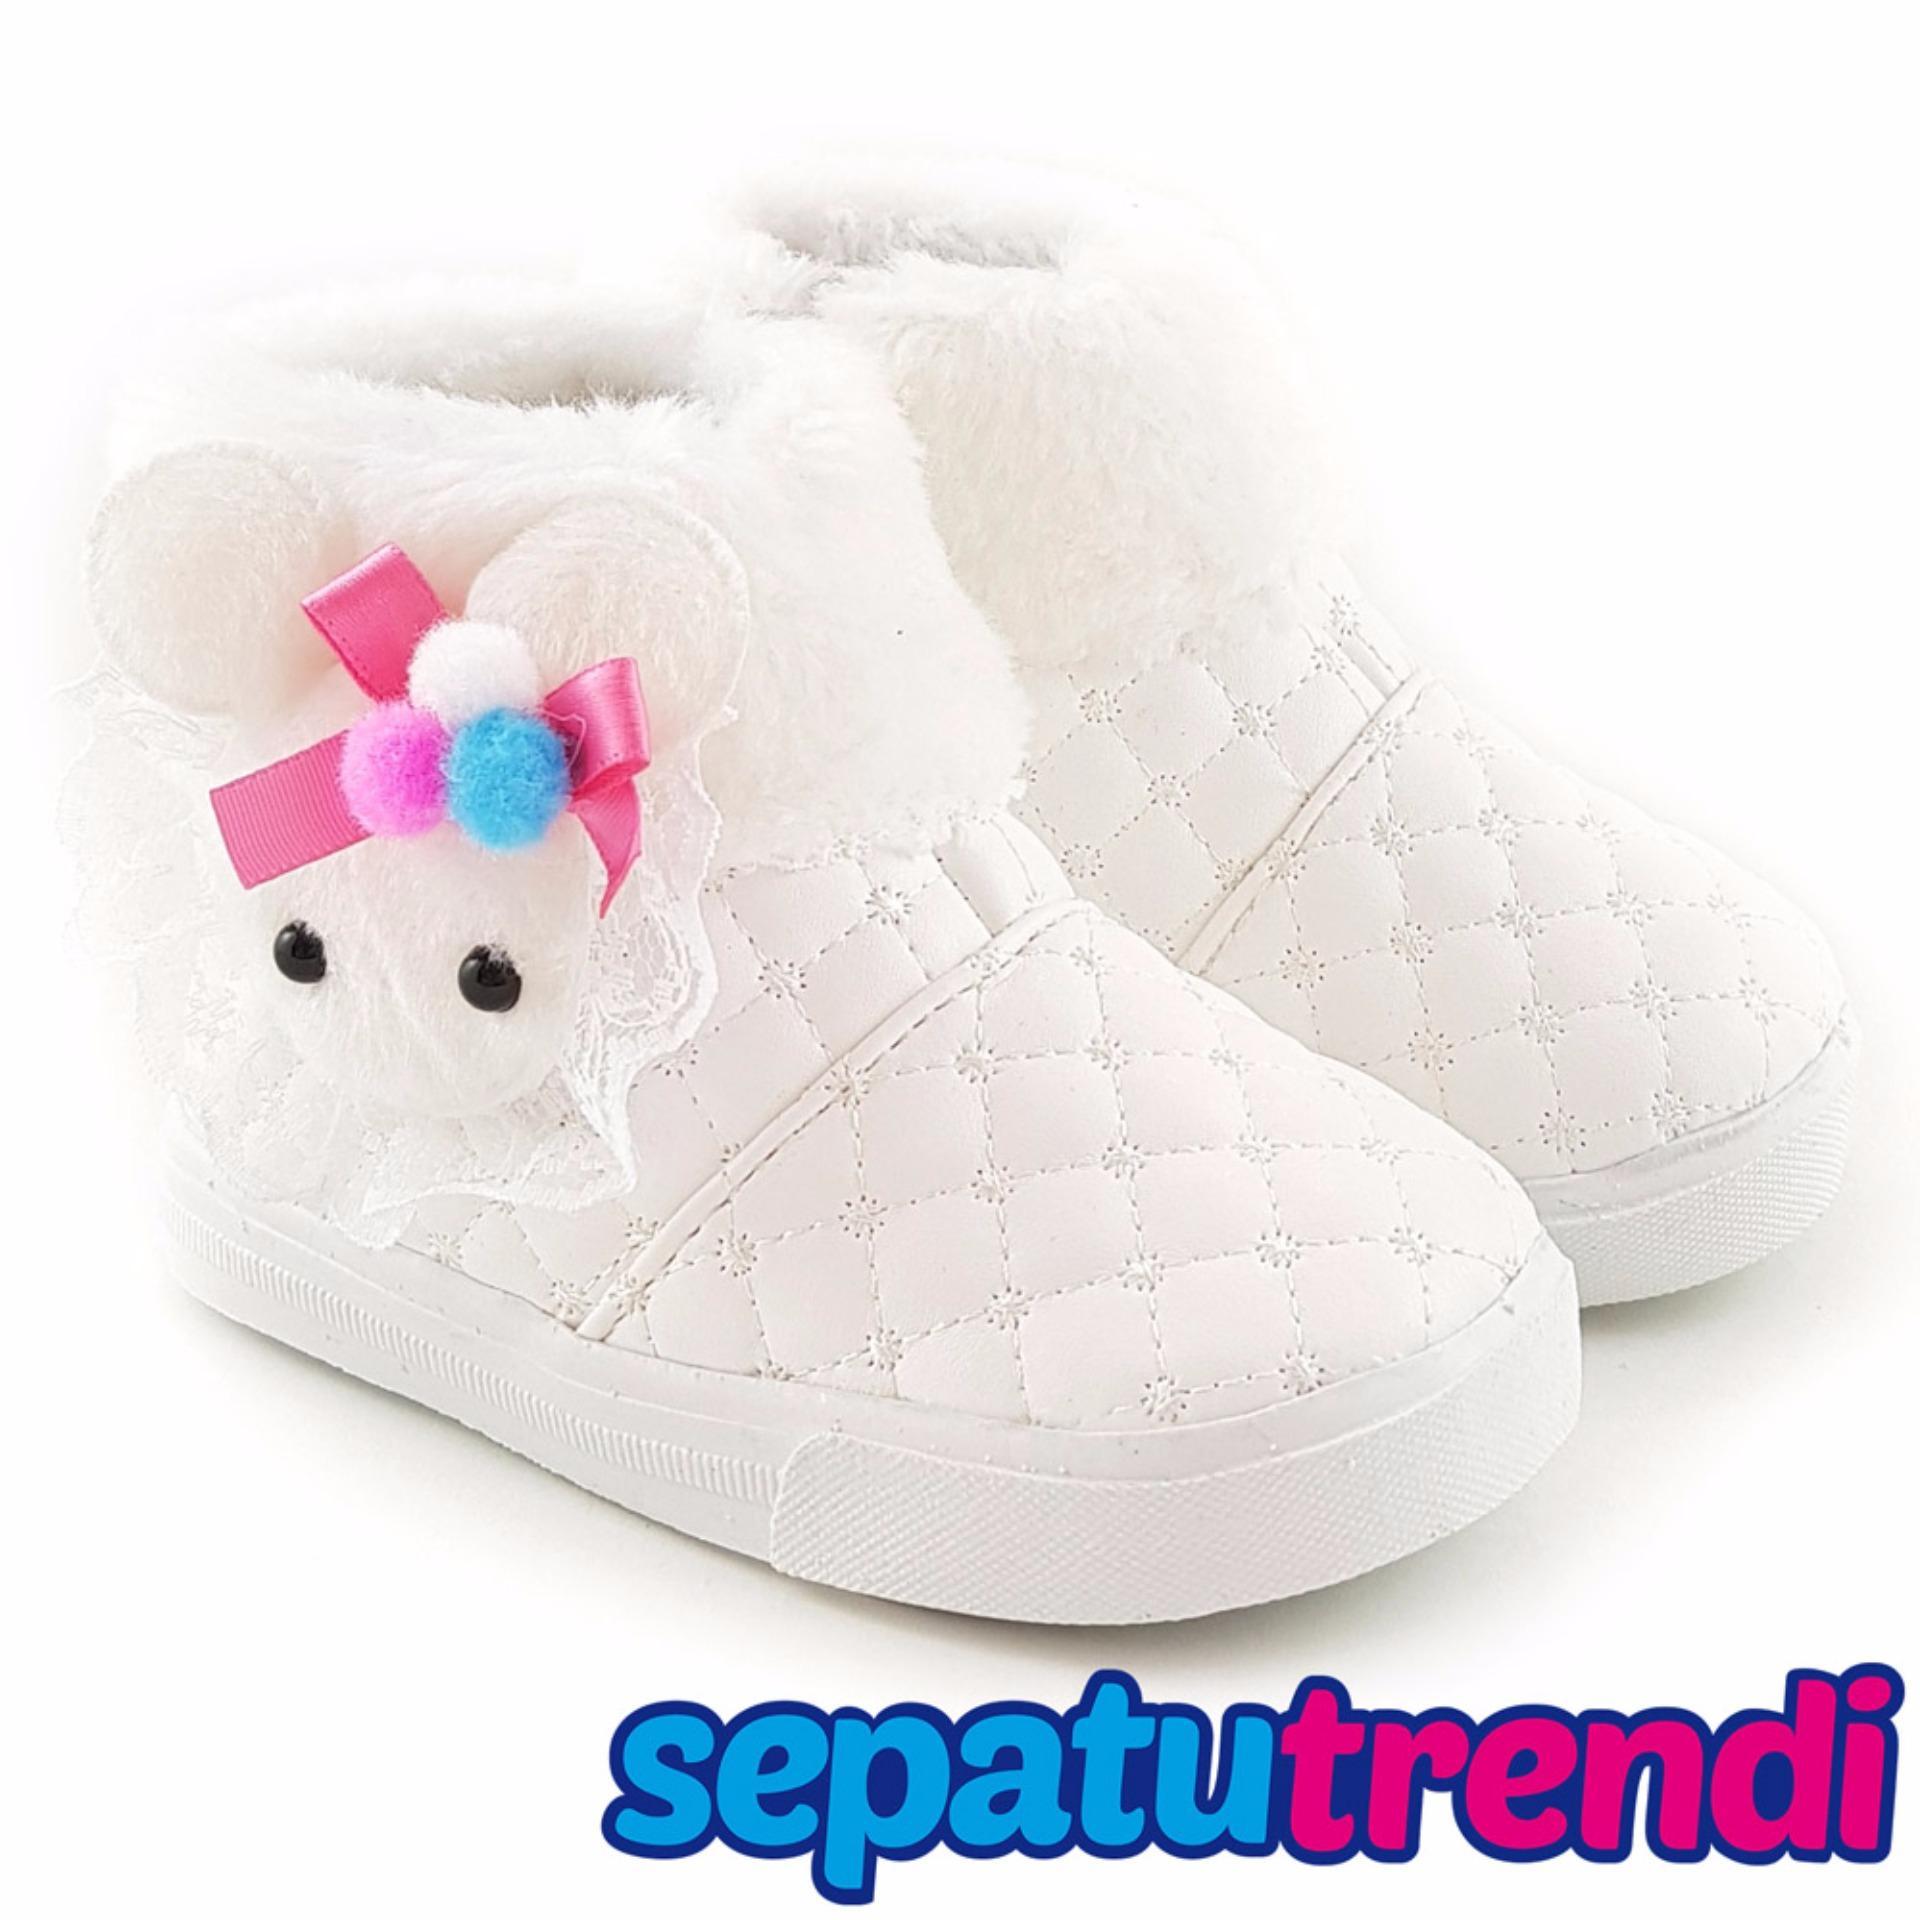 Beli Trendishoes Sepatu Boot Anak Perempuan Boneka Bulu Blbnk White Online Indonesia